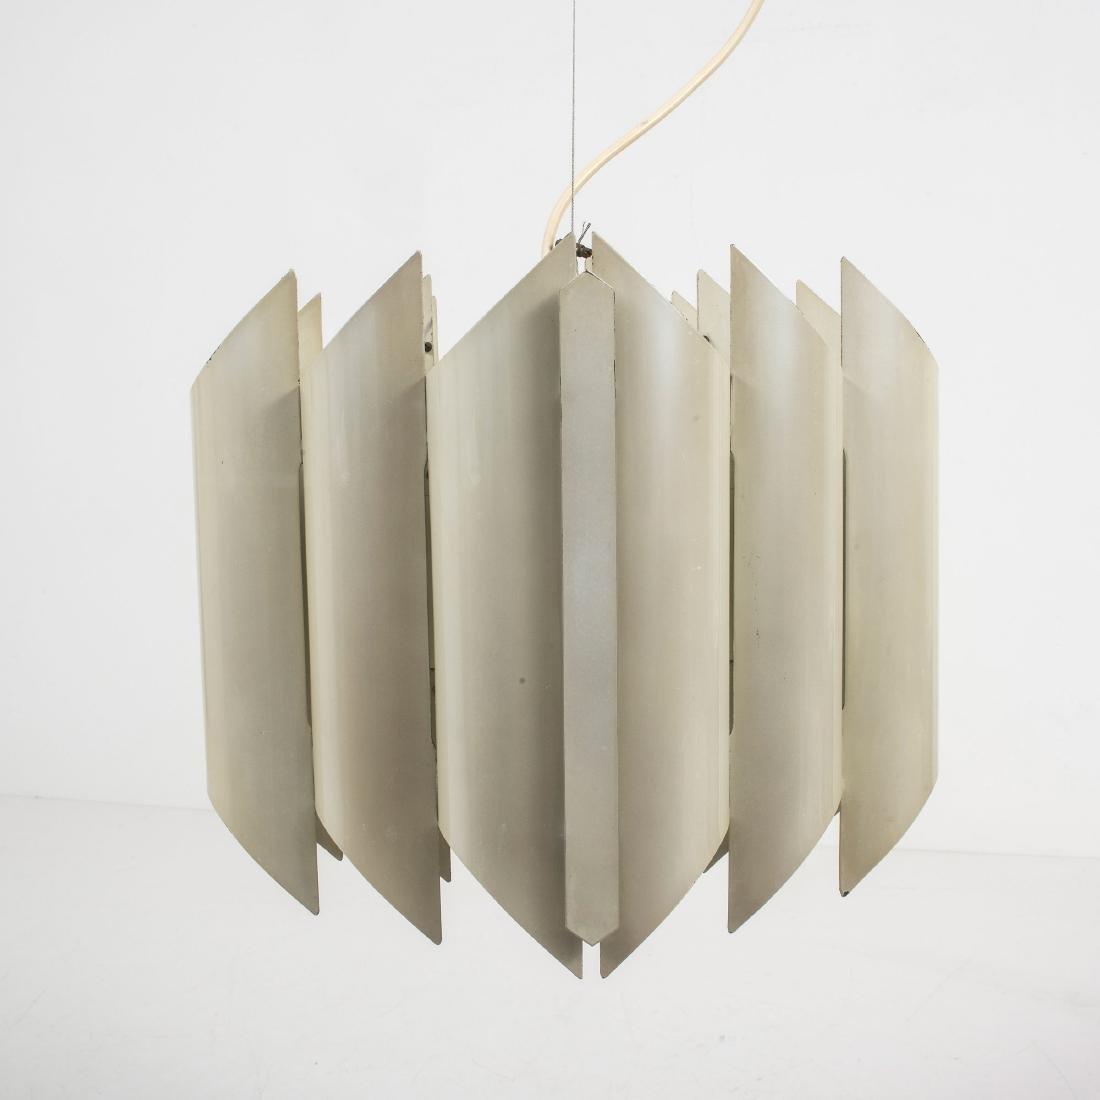 Ceiling light, c. 1965 - 2